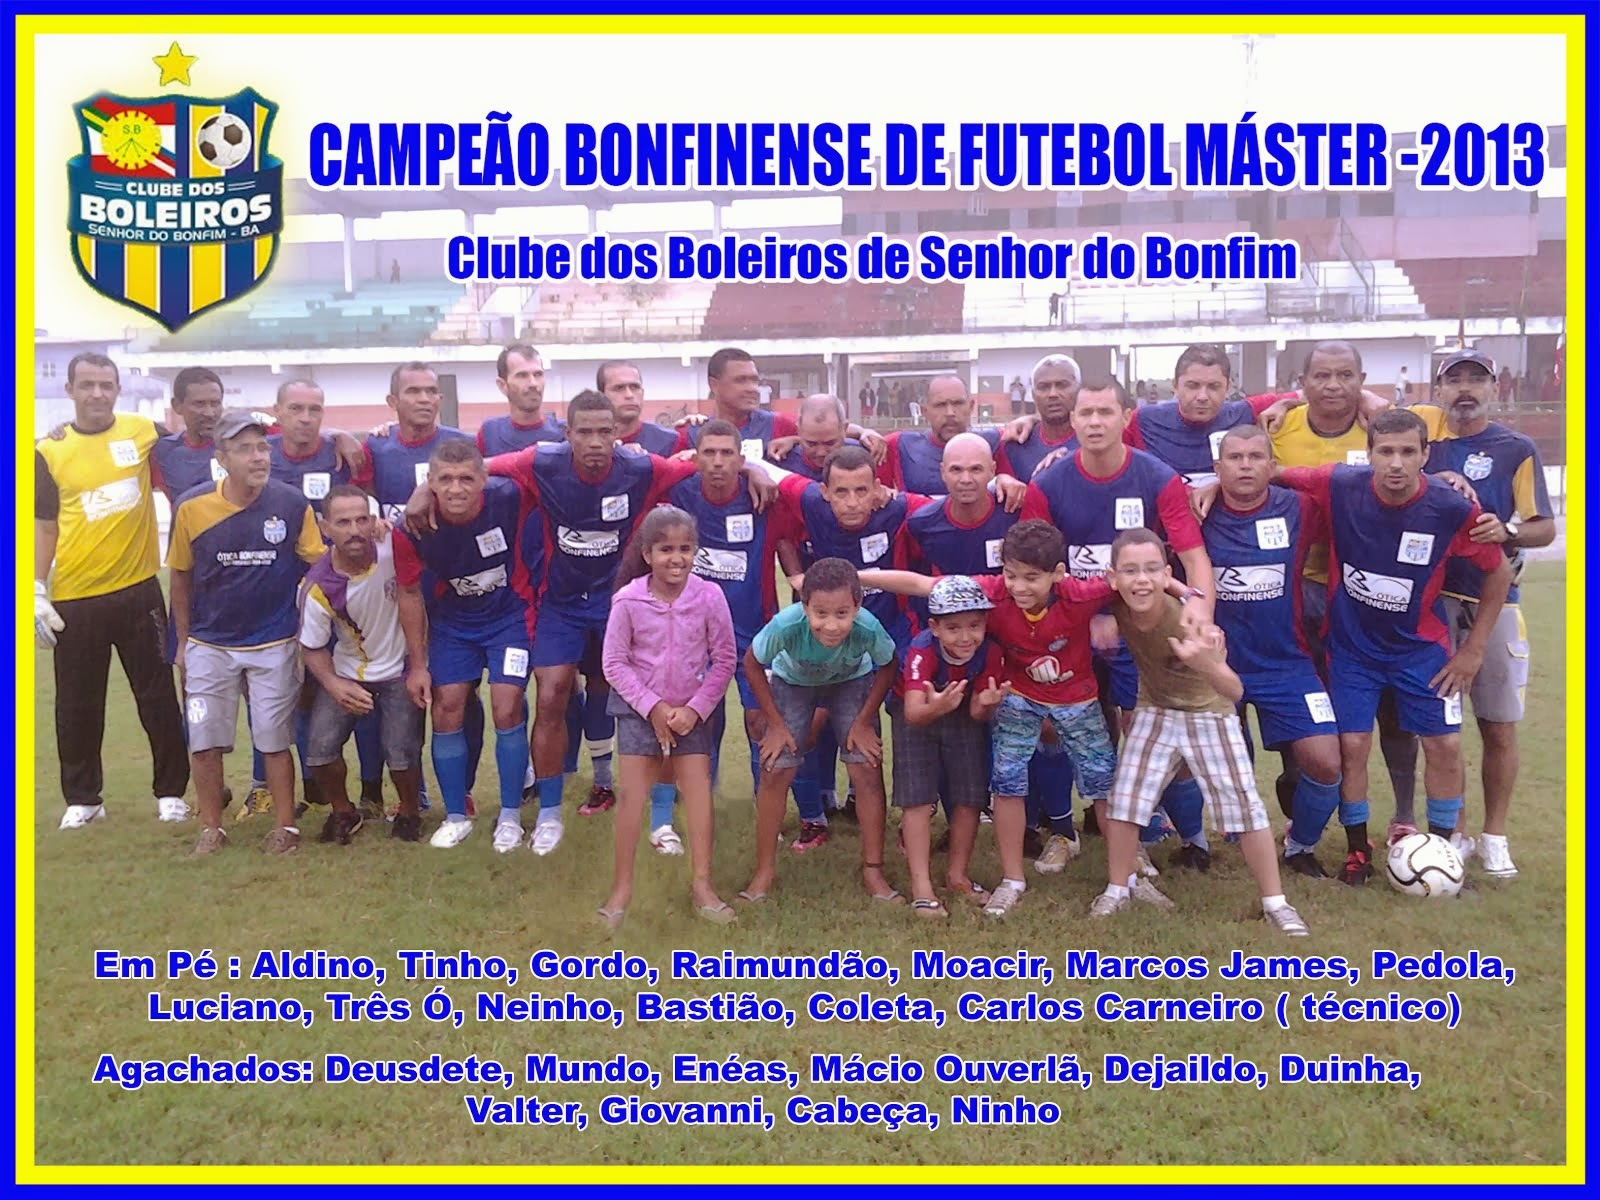 CAMPEÃO BONFINENSE DE FUTEBOL MÁSTER 2013